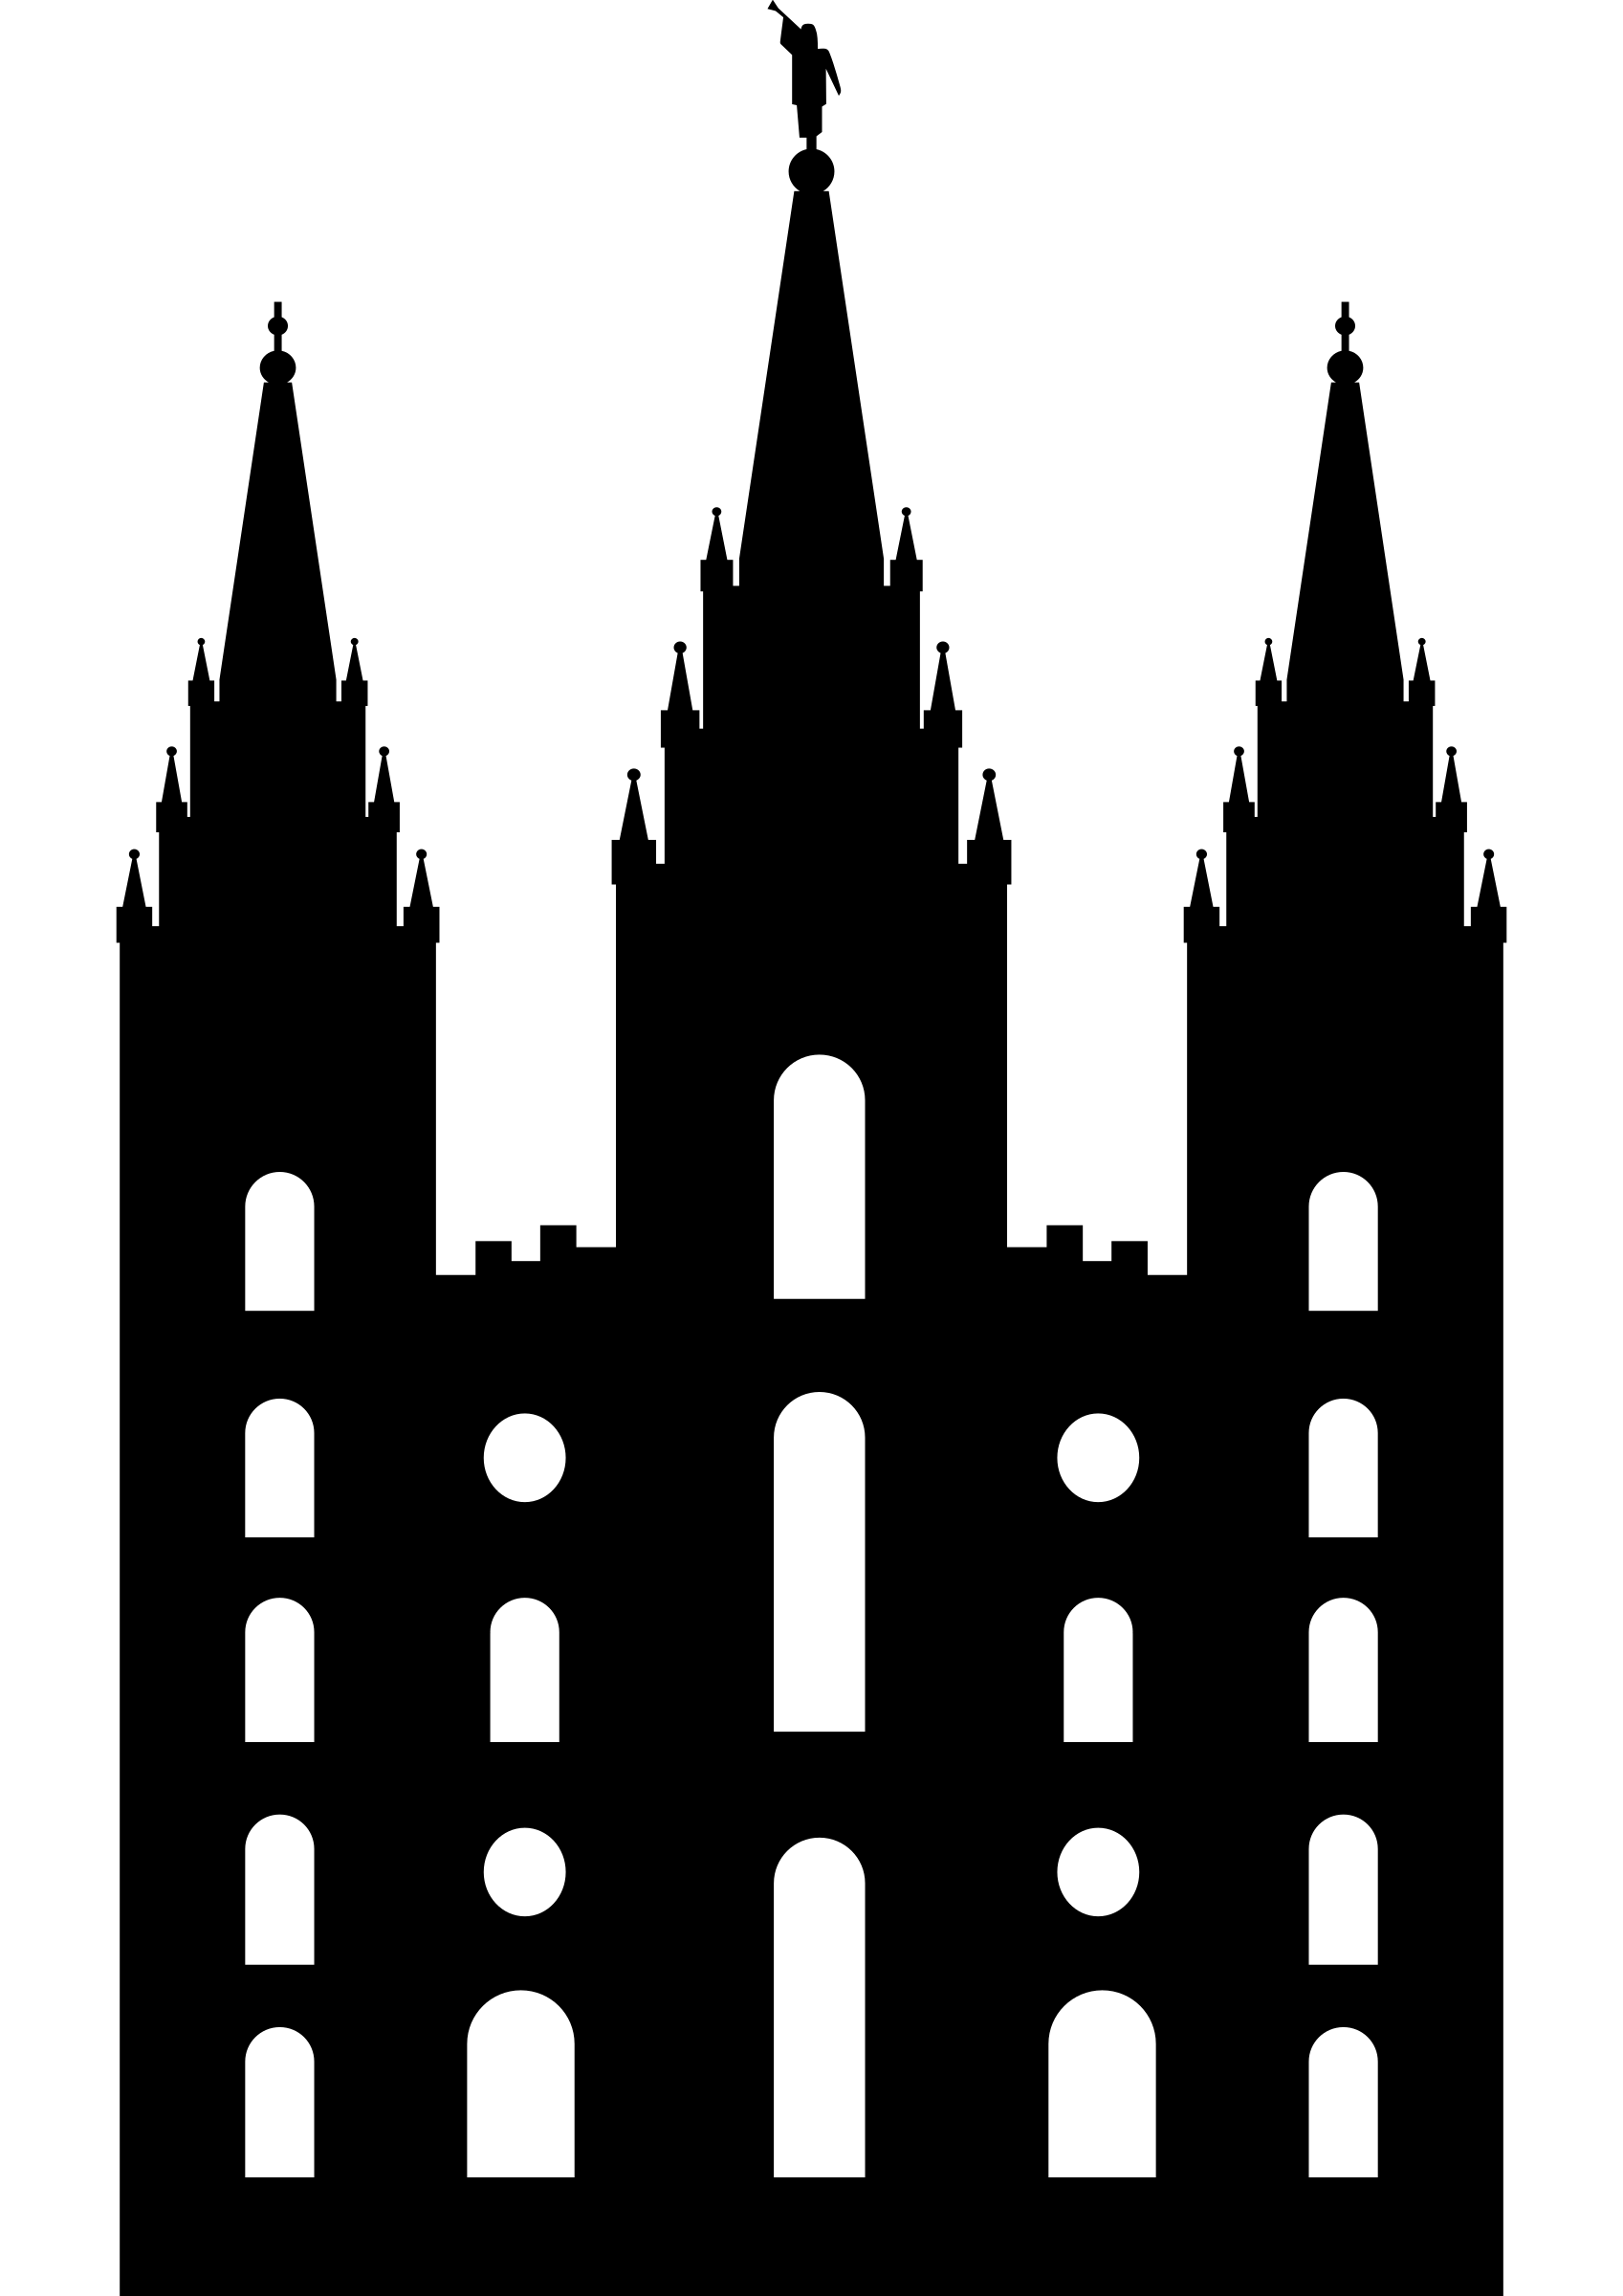 lake clipart icon